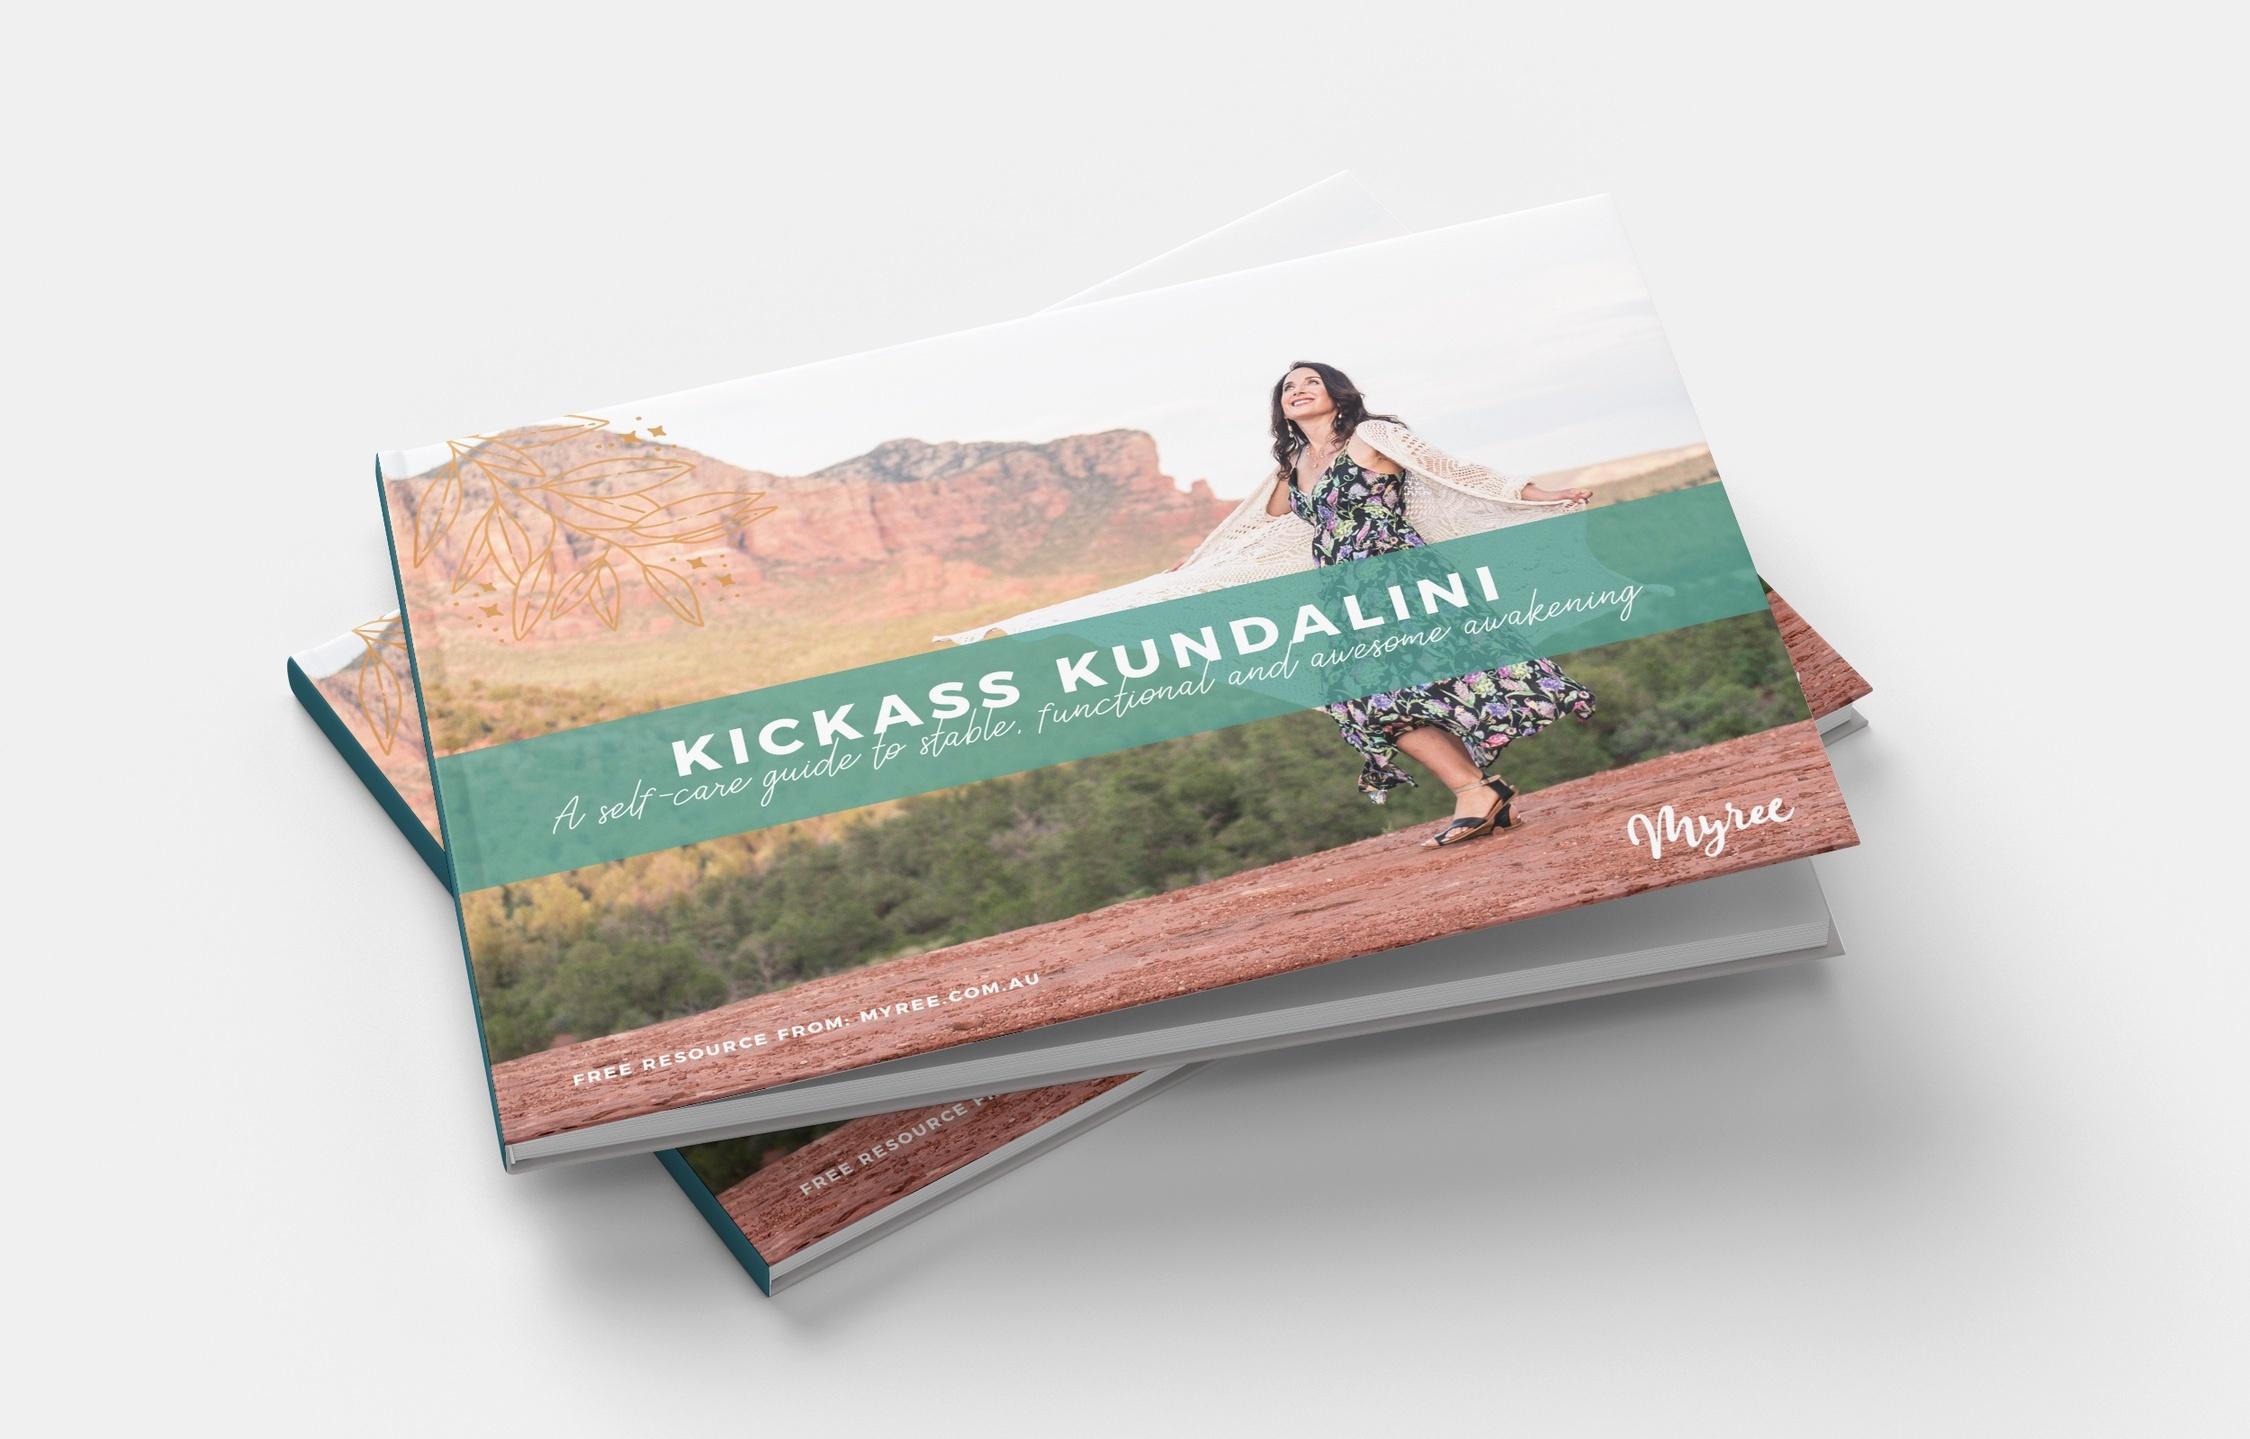 Kickass Kundalini e-book by Myree Morsi